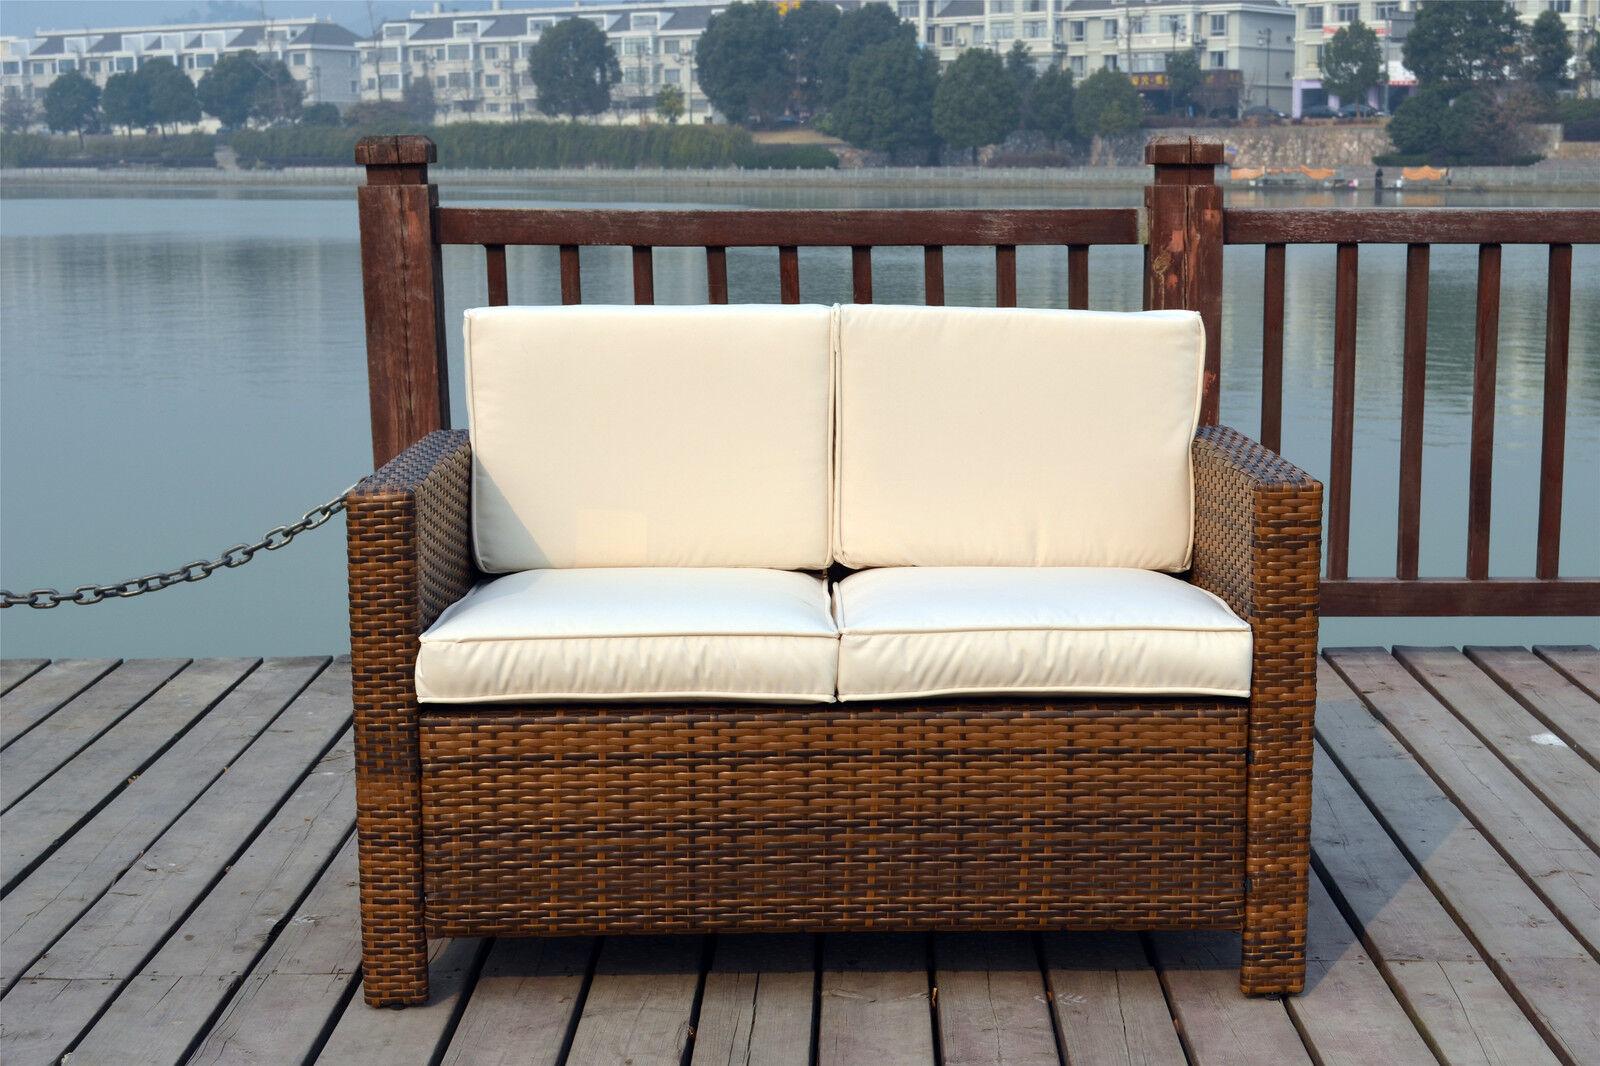 Garden Furniture - NEW TWIN RATTAN WICKER CONSERVATORY OUTDOOR GARDEN FURNITURE SET